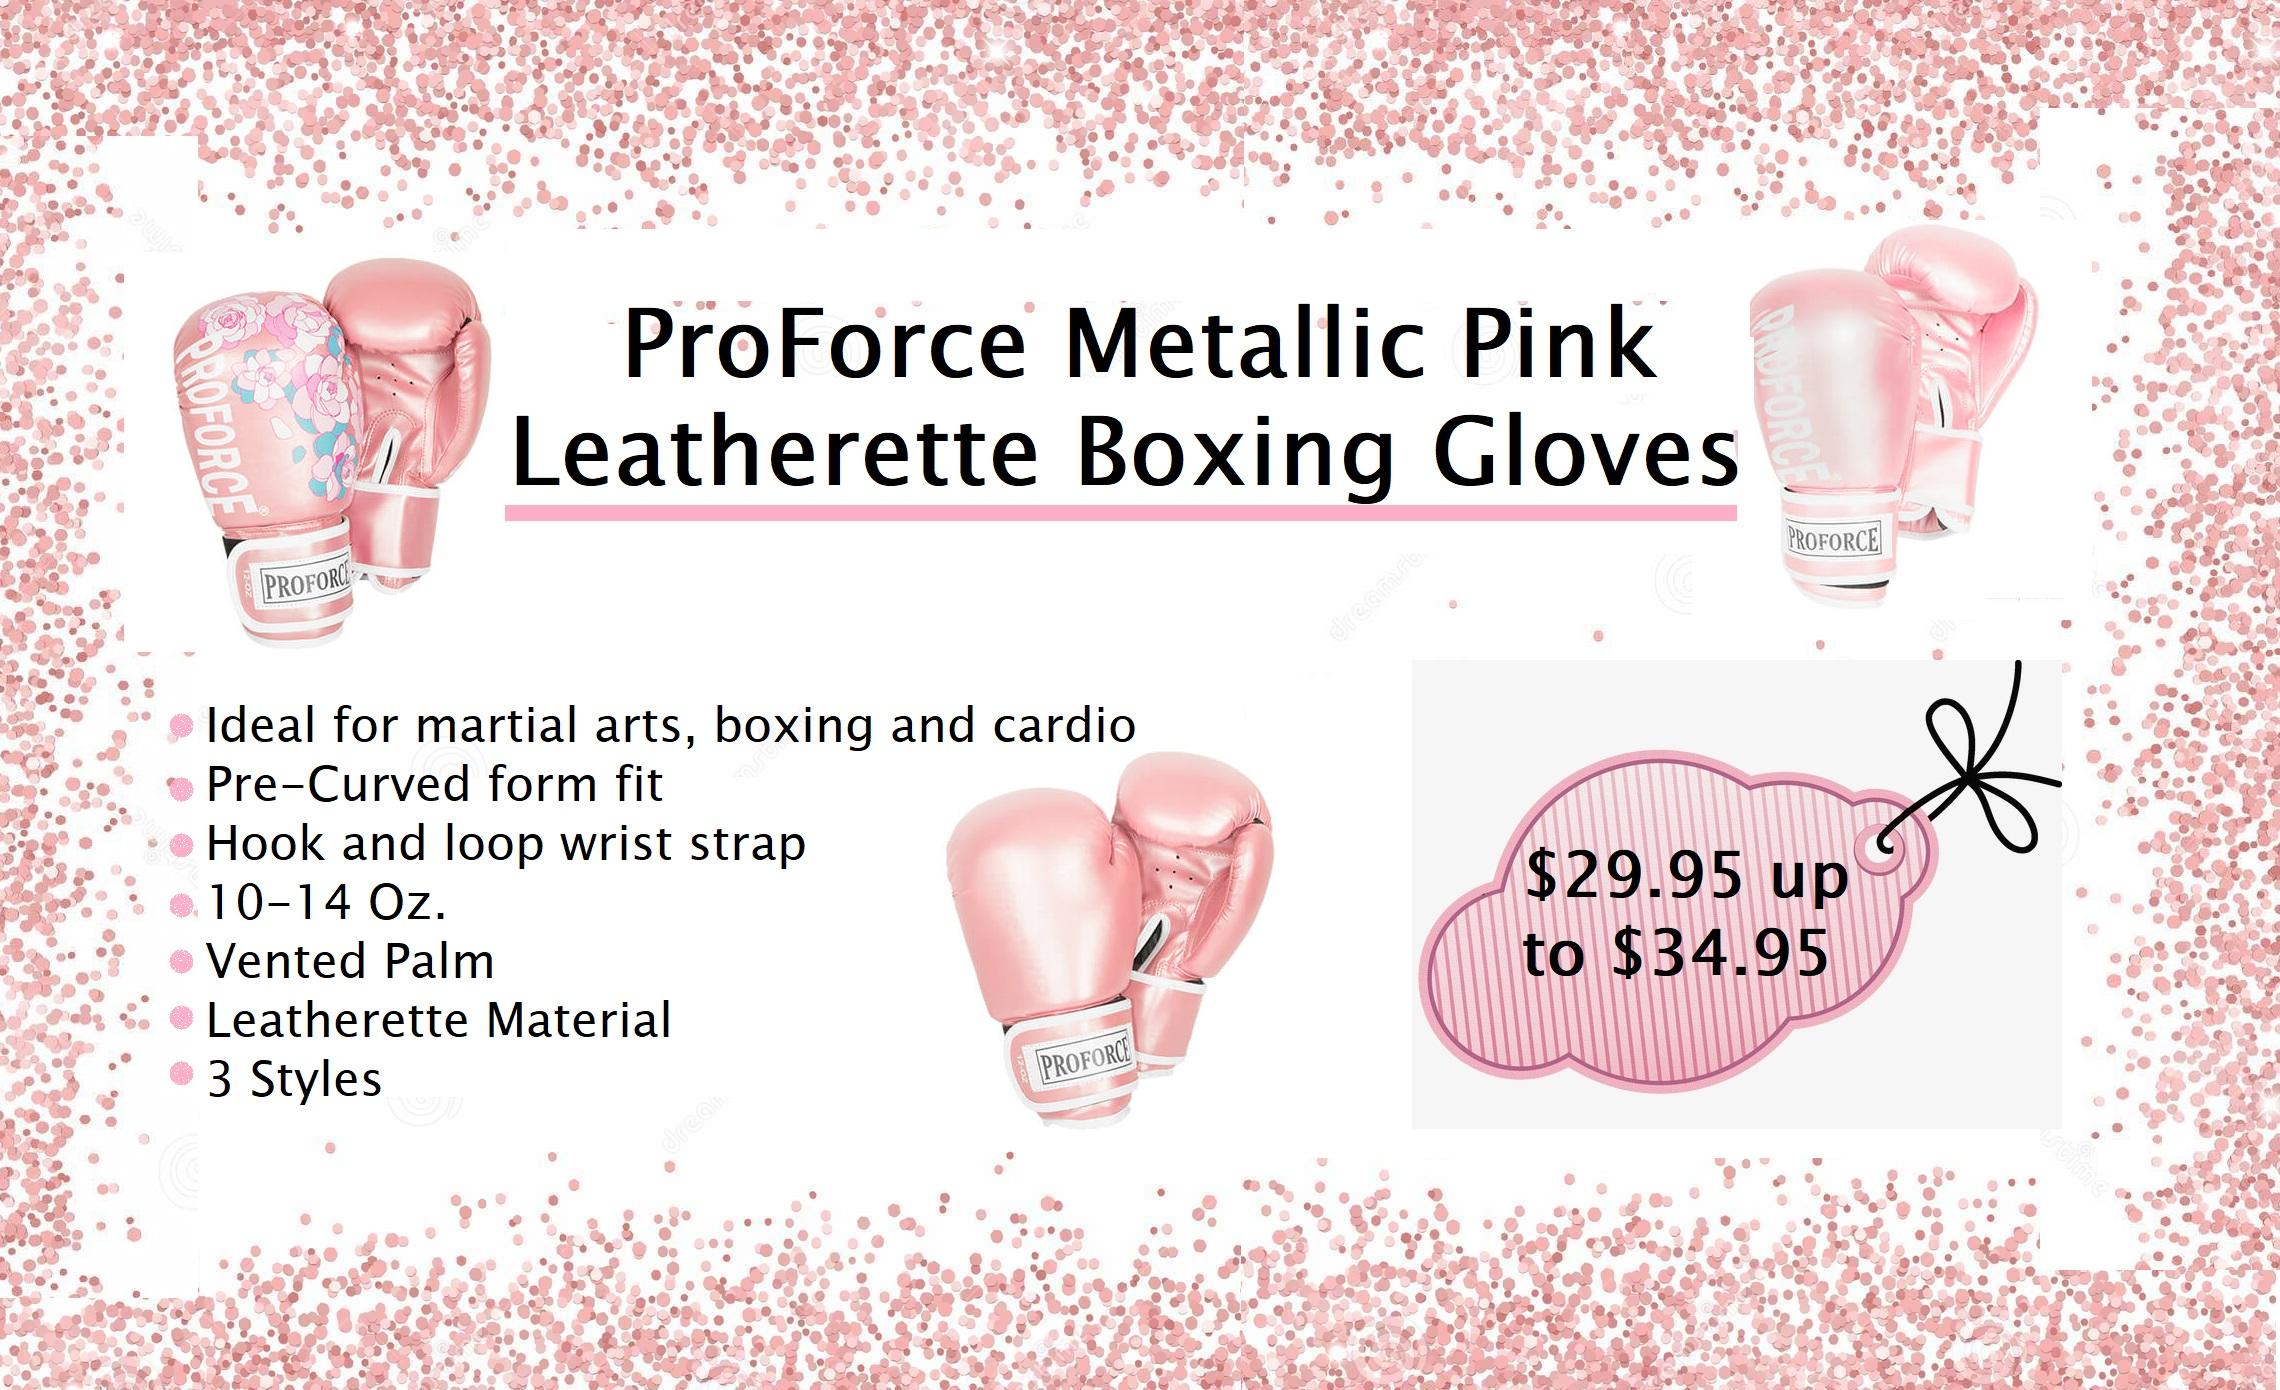 ProForce Leatherette Boxing Glove – Metallic Pink